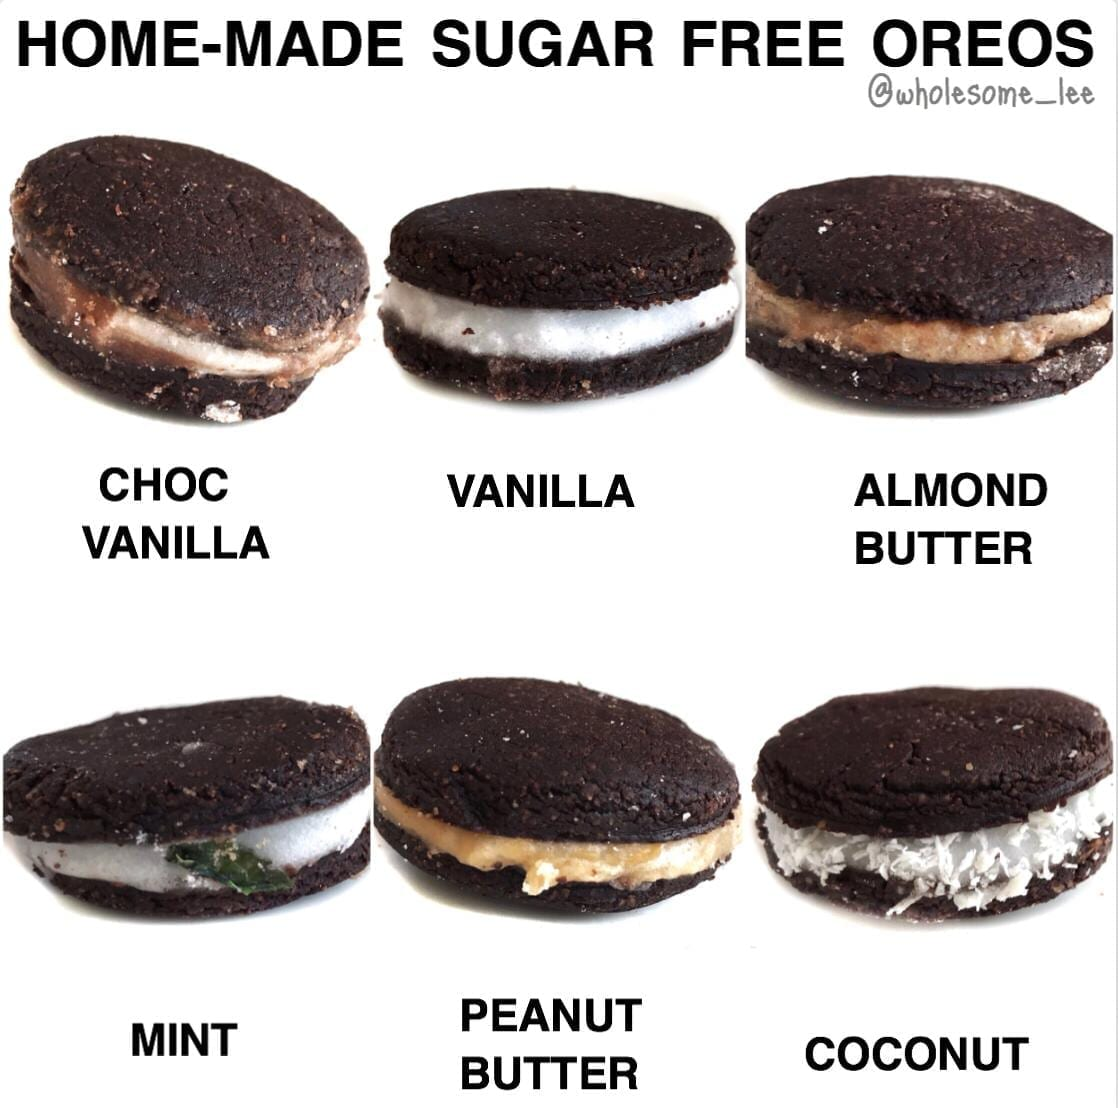 Homemade Sugar Free Oreos